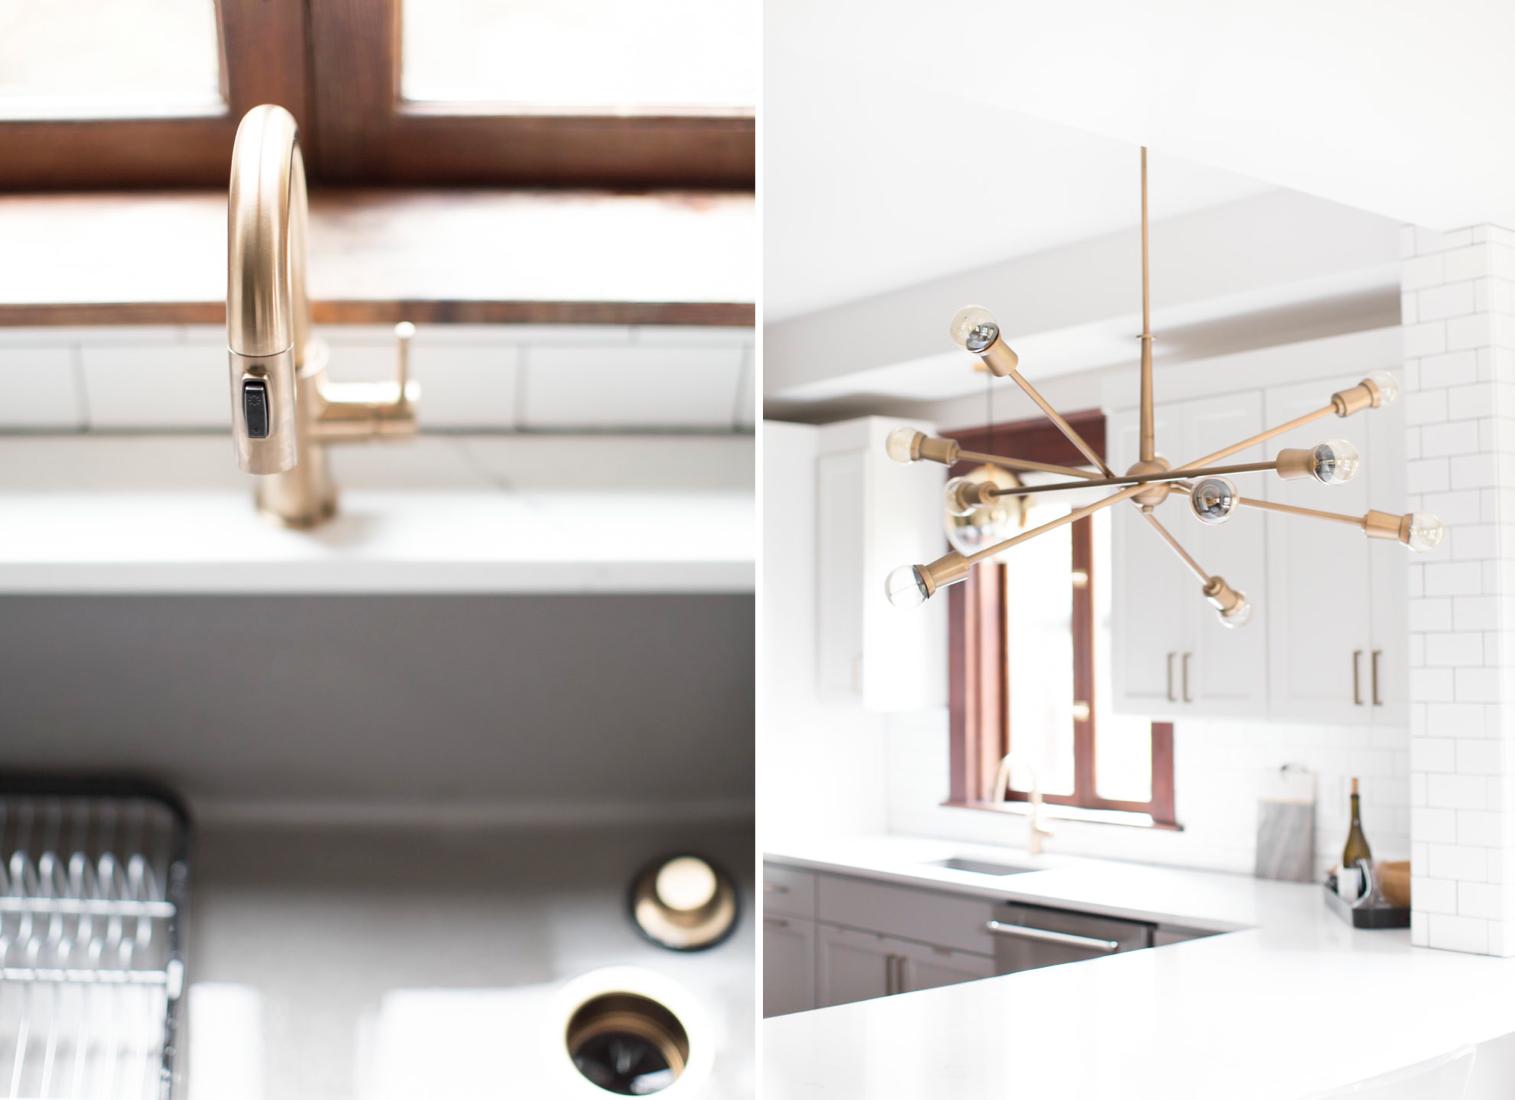 olivia_ashton_photography_interior_design6